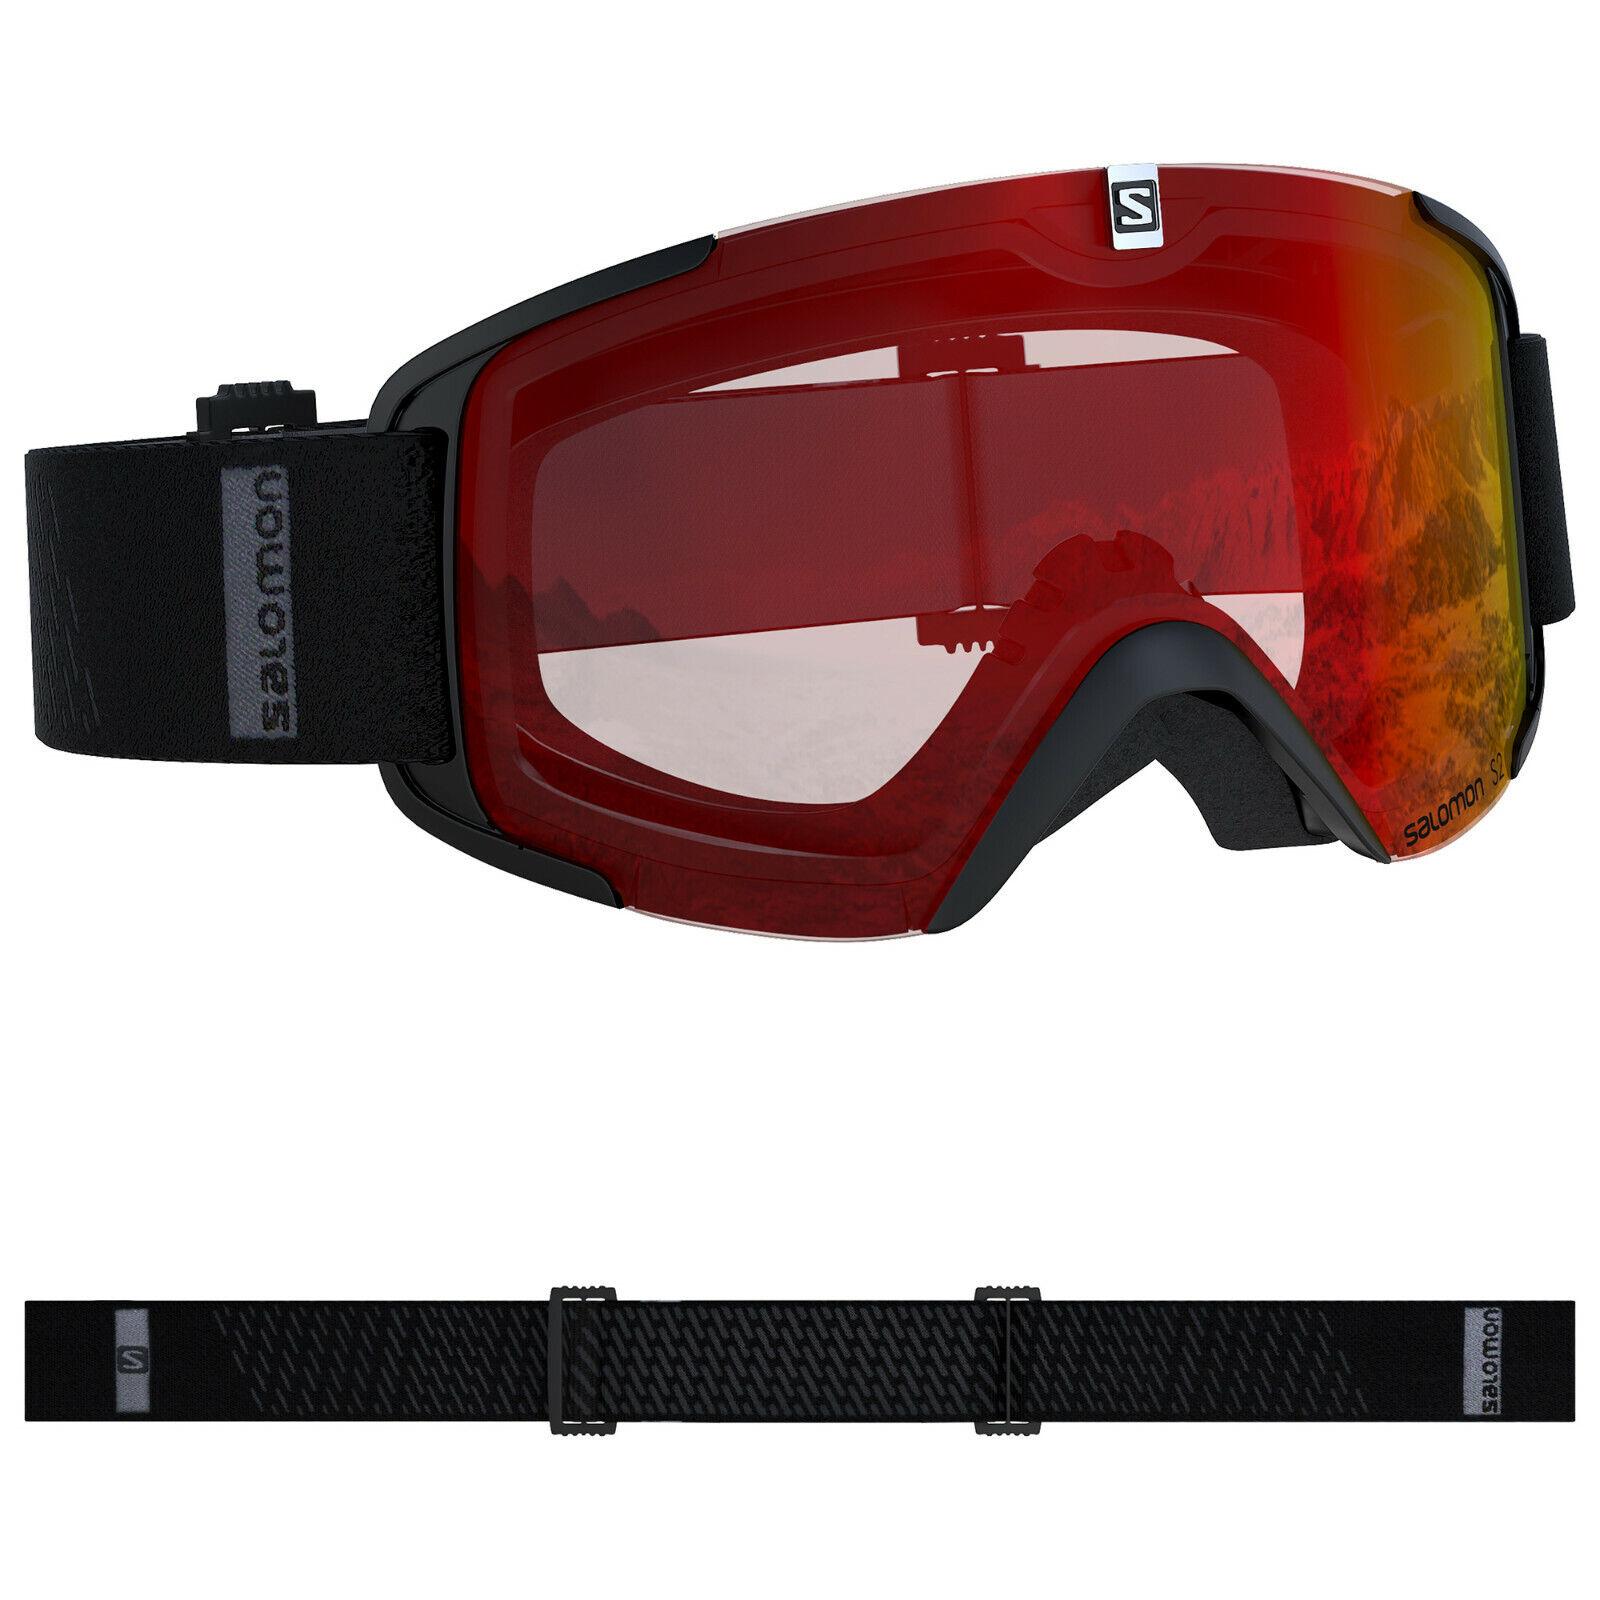 SALOMON XVIEW Skibrille Snowboardbrille (schwarz-mid-rot) Collection 2020 NEU